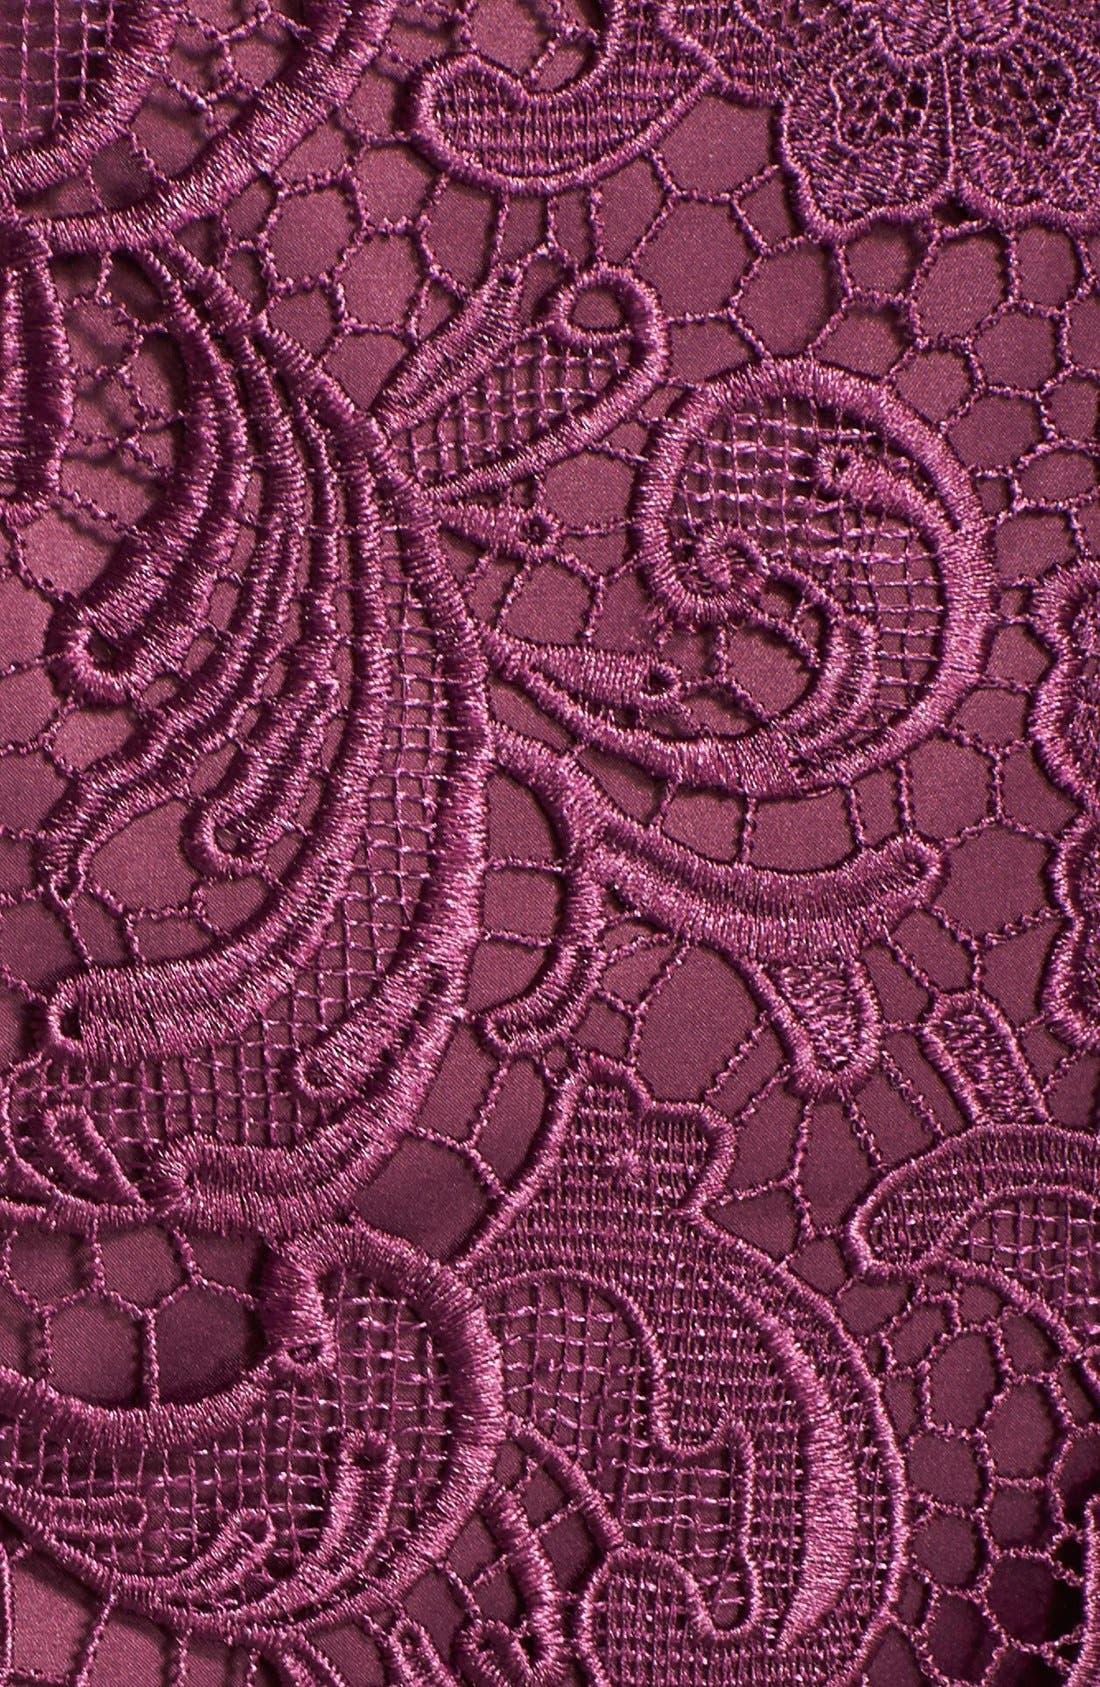 Illusion Bodice Lace Sheath Dress,                             Alternate thumbnail 39, color,